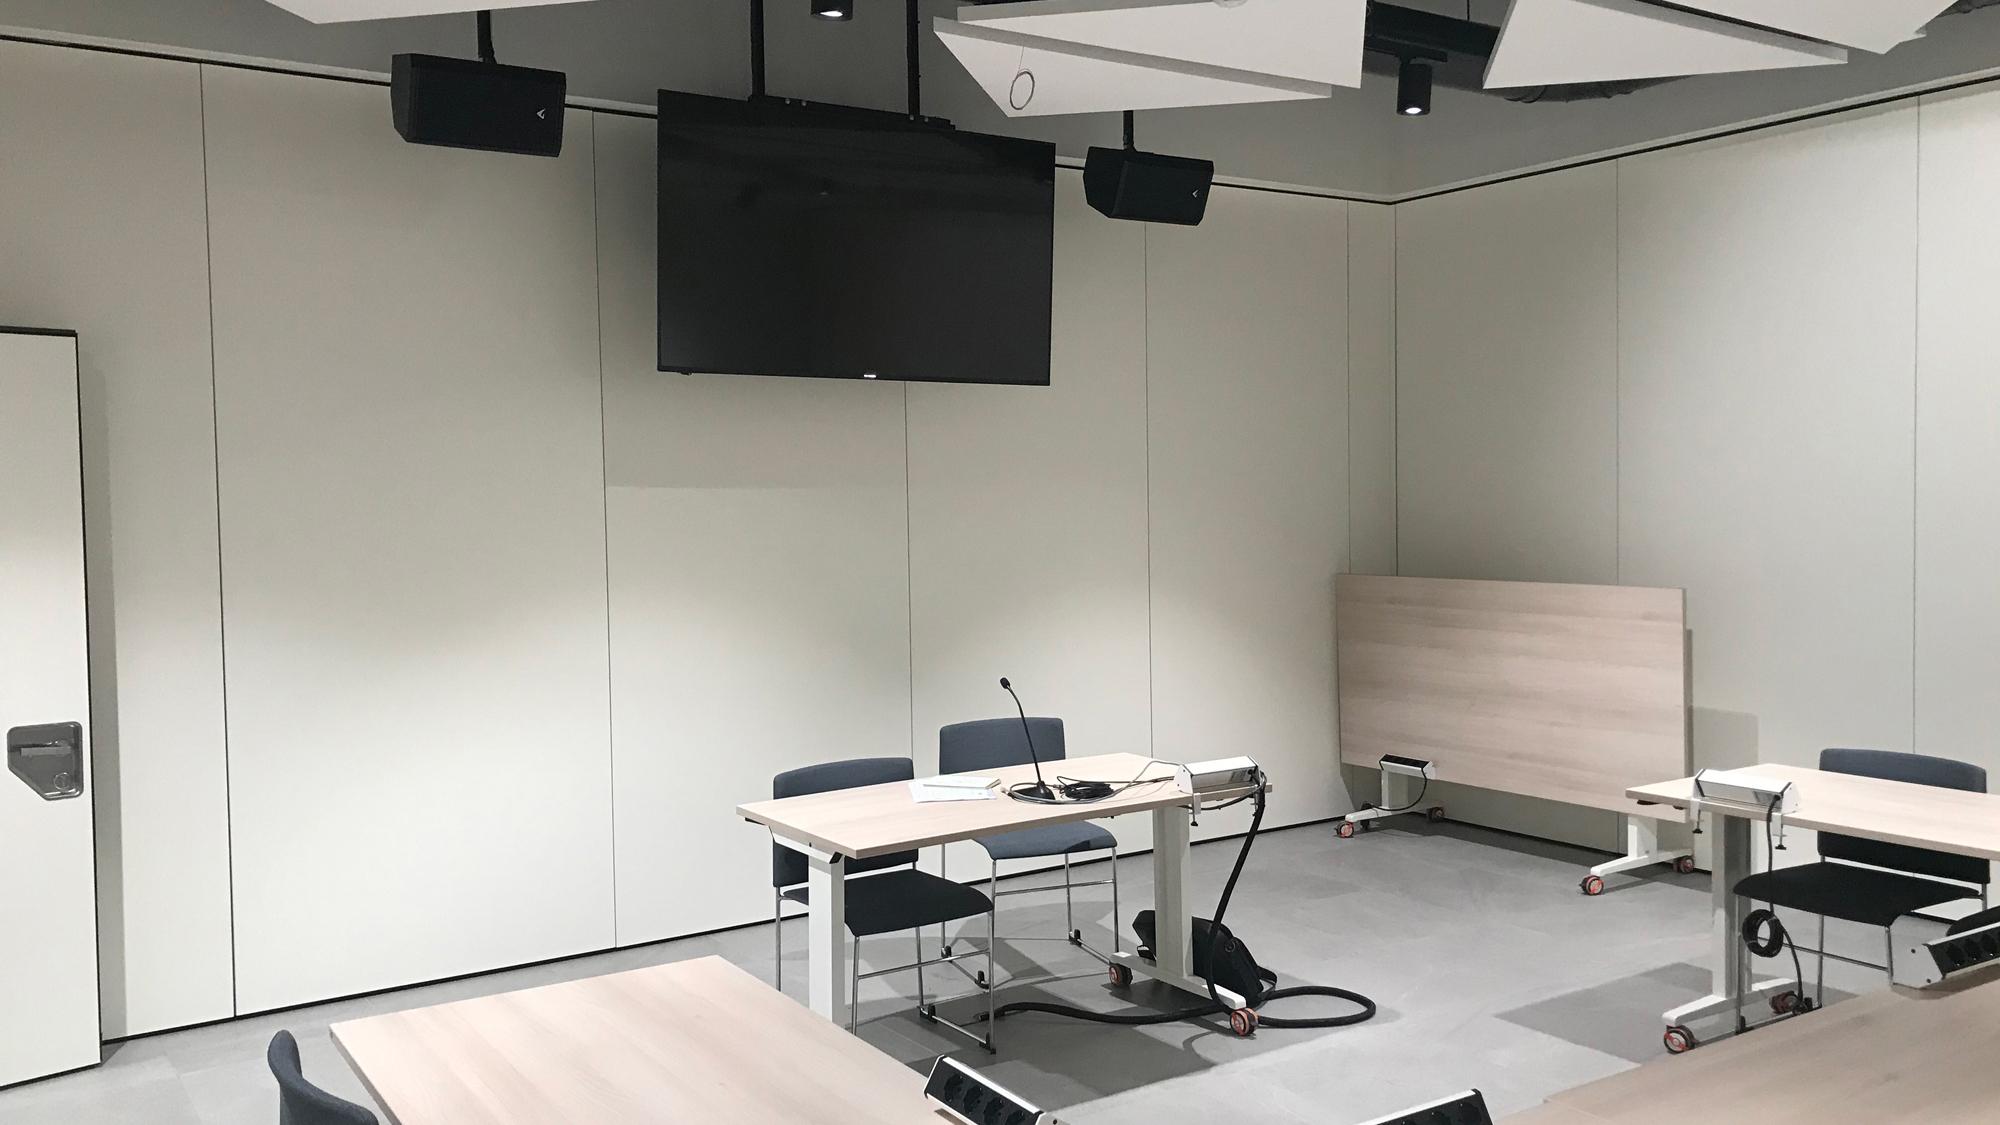 installazione multimediale auditorium smc italia